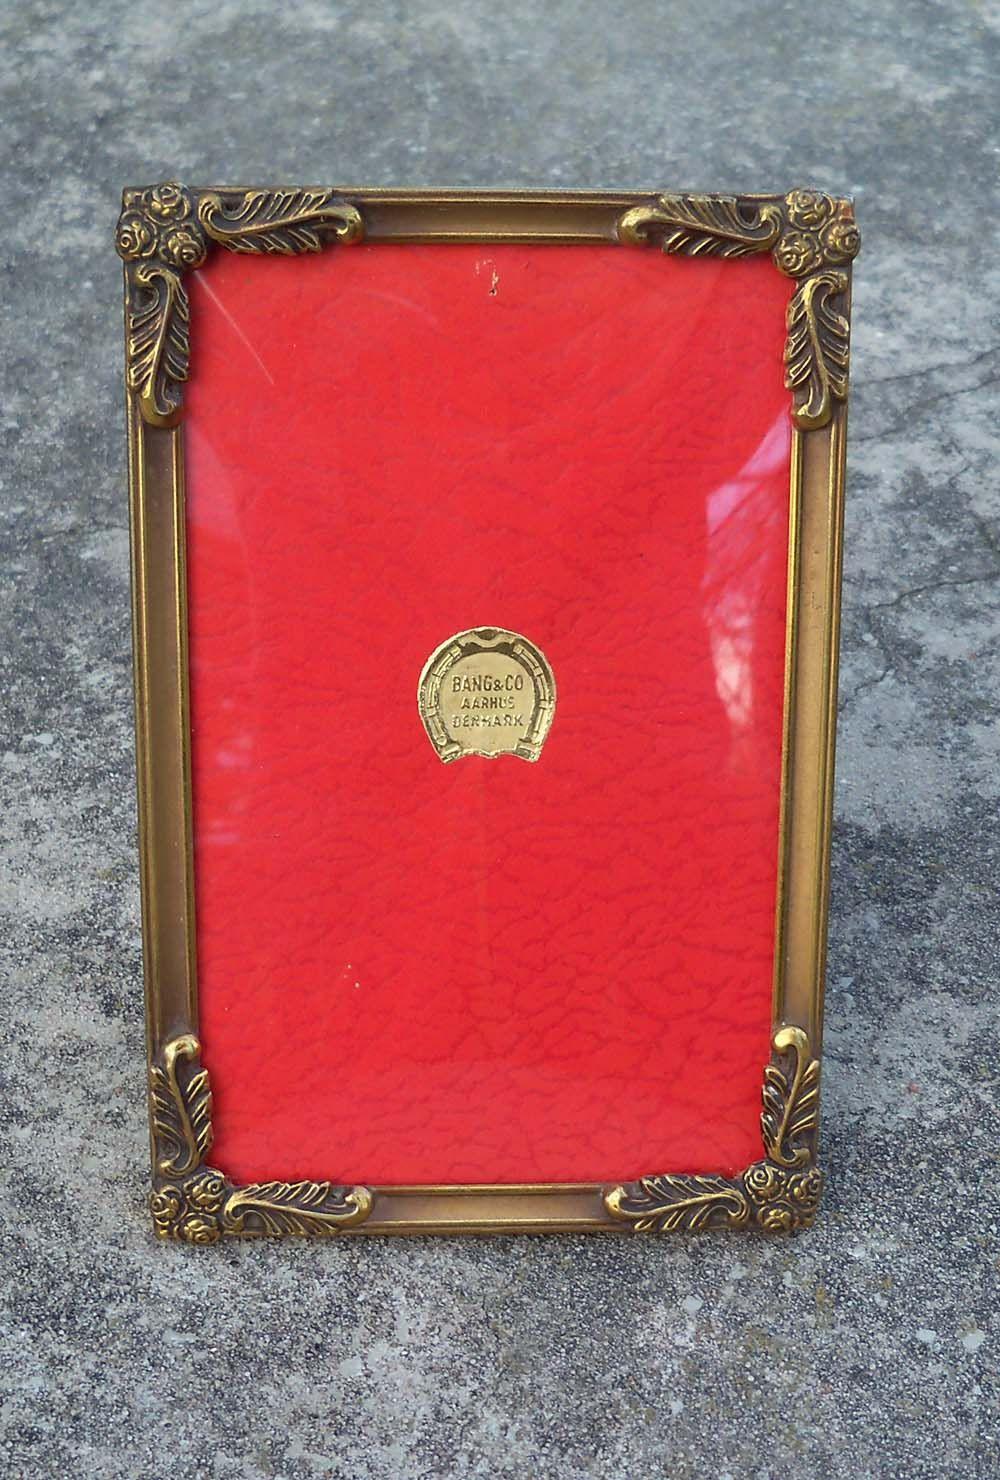 Pin Penaroyal Antiques & Collectibles